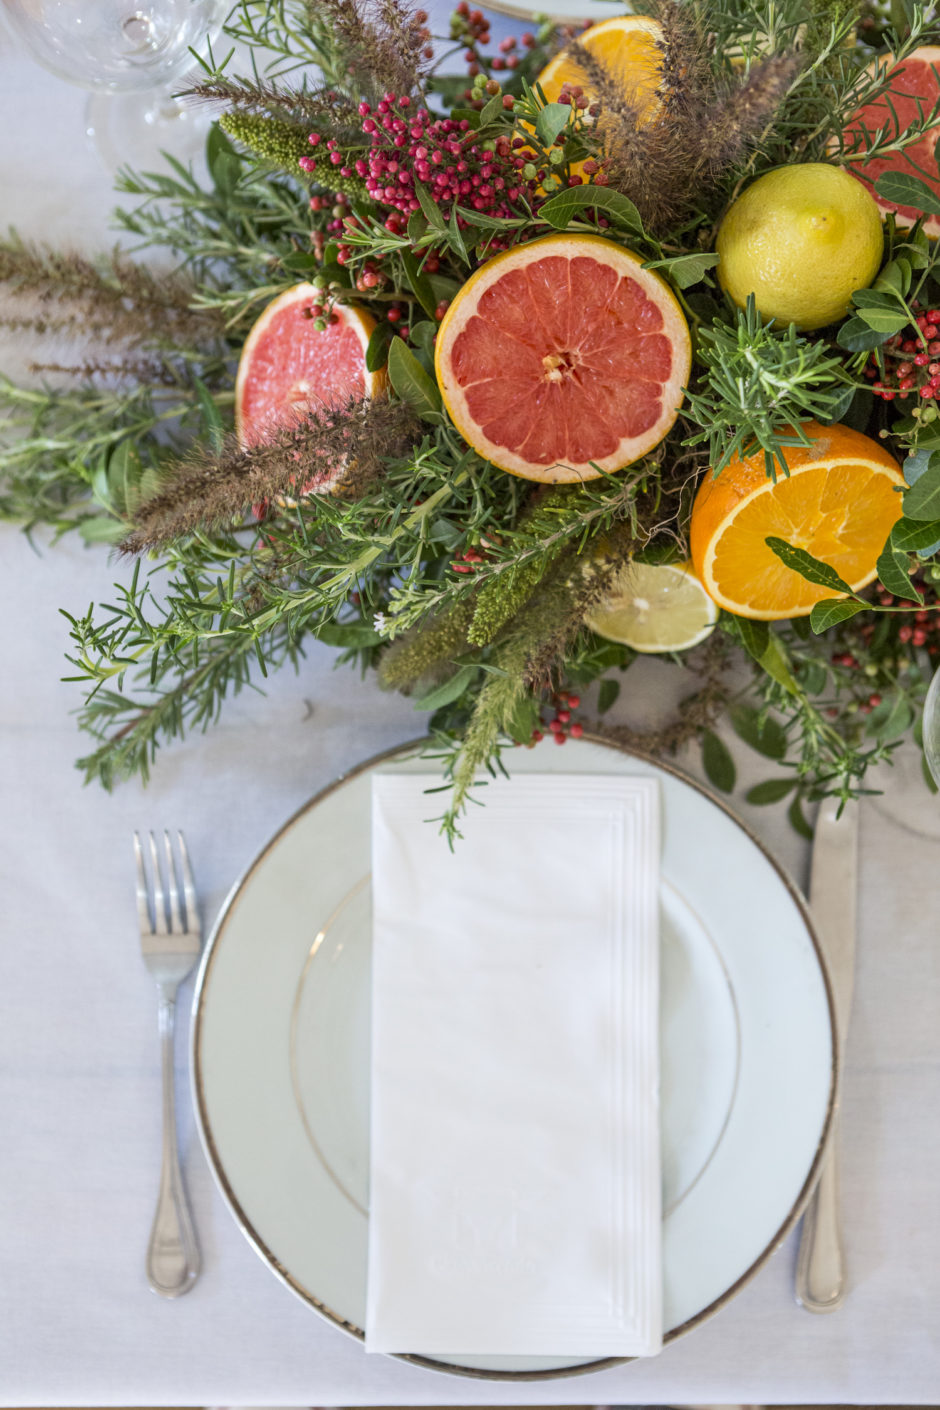 mesa posta com louça branca e arranjo colorido para churrascada